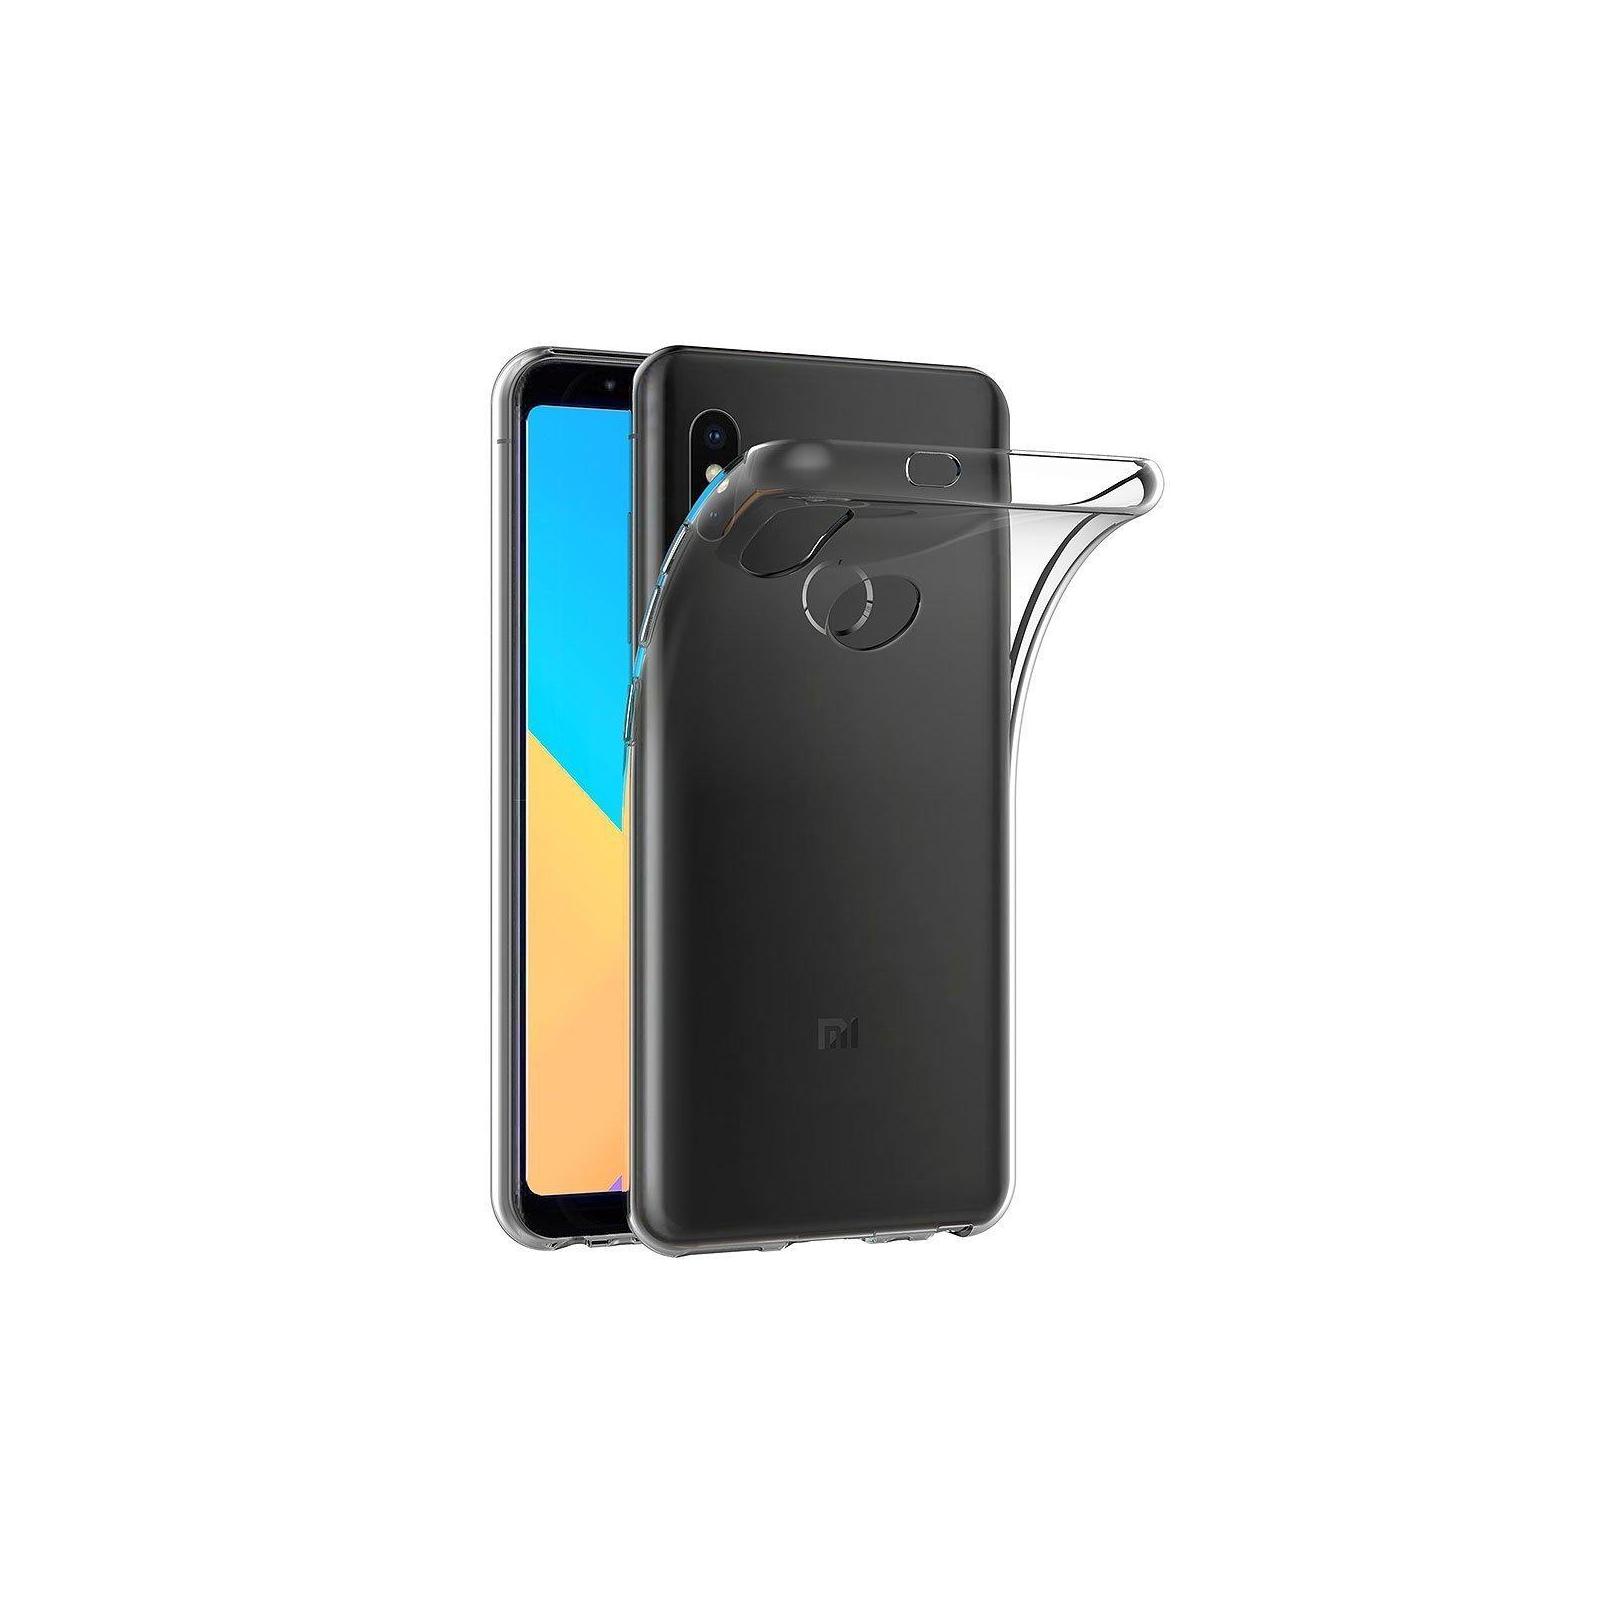 Чехол для моб. телефона Laudtec для Xiaomi Redmi Note 5 Pro Clear tpu (Transperent) (LC-XRN5P)